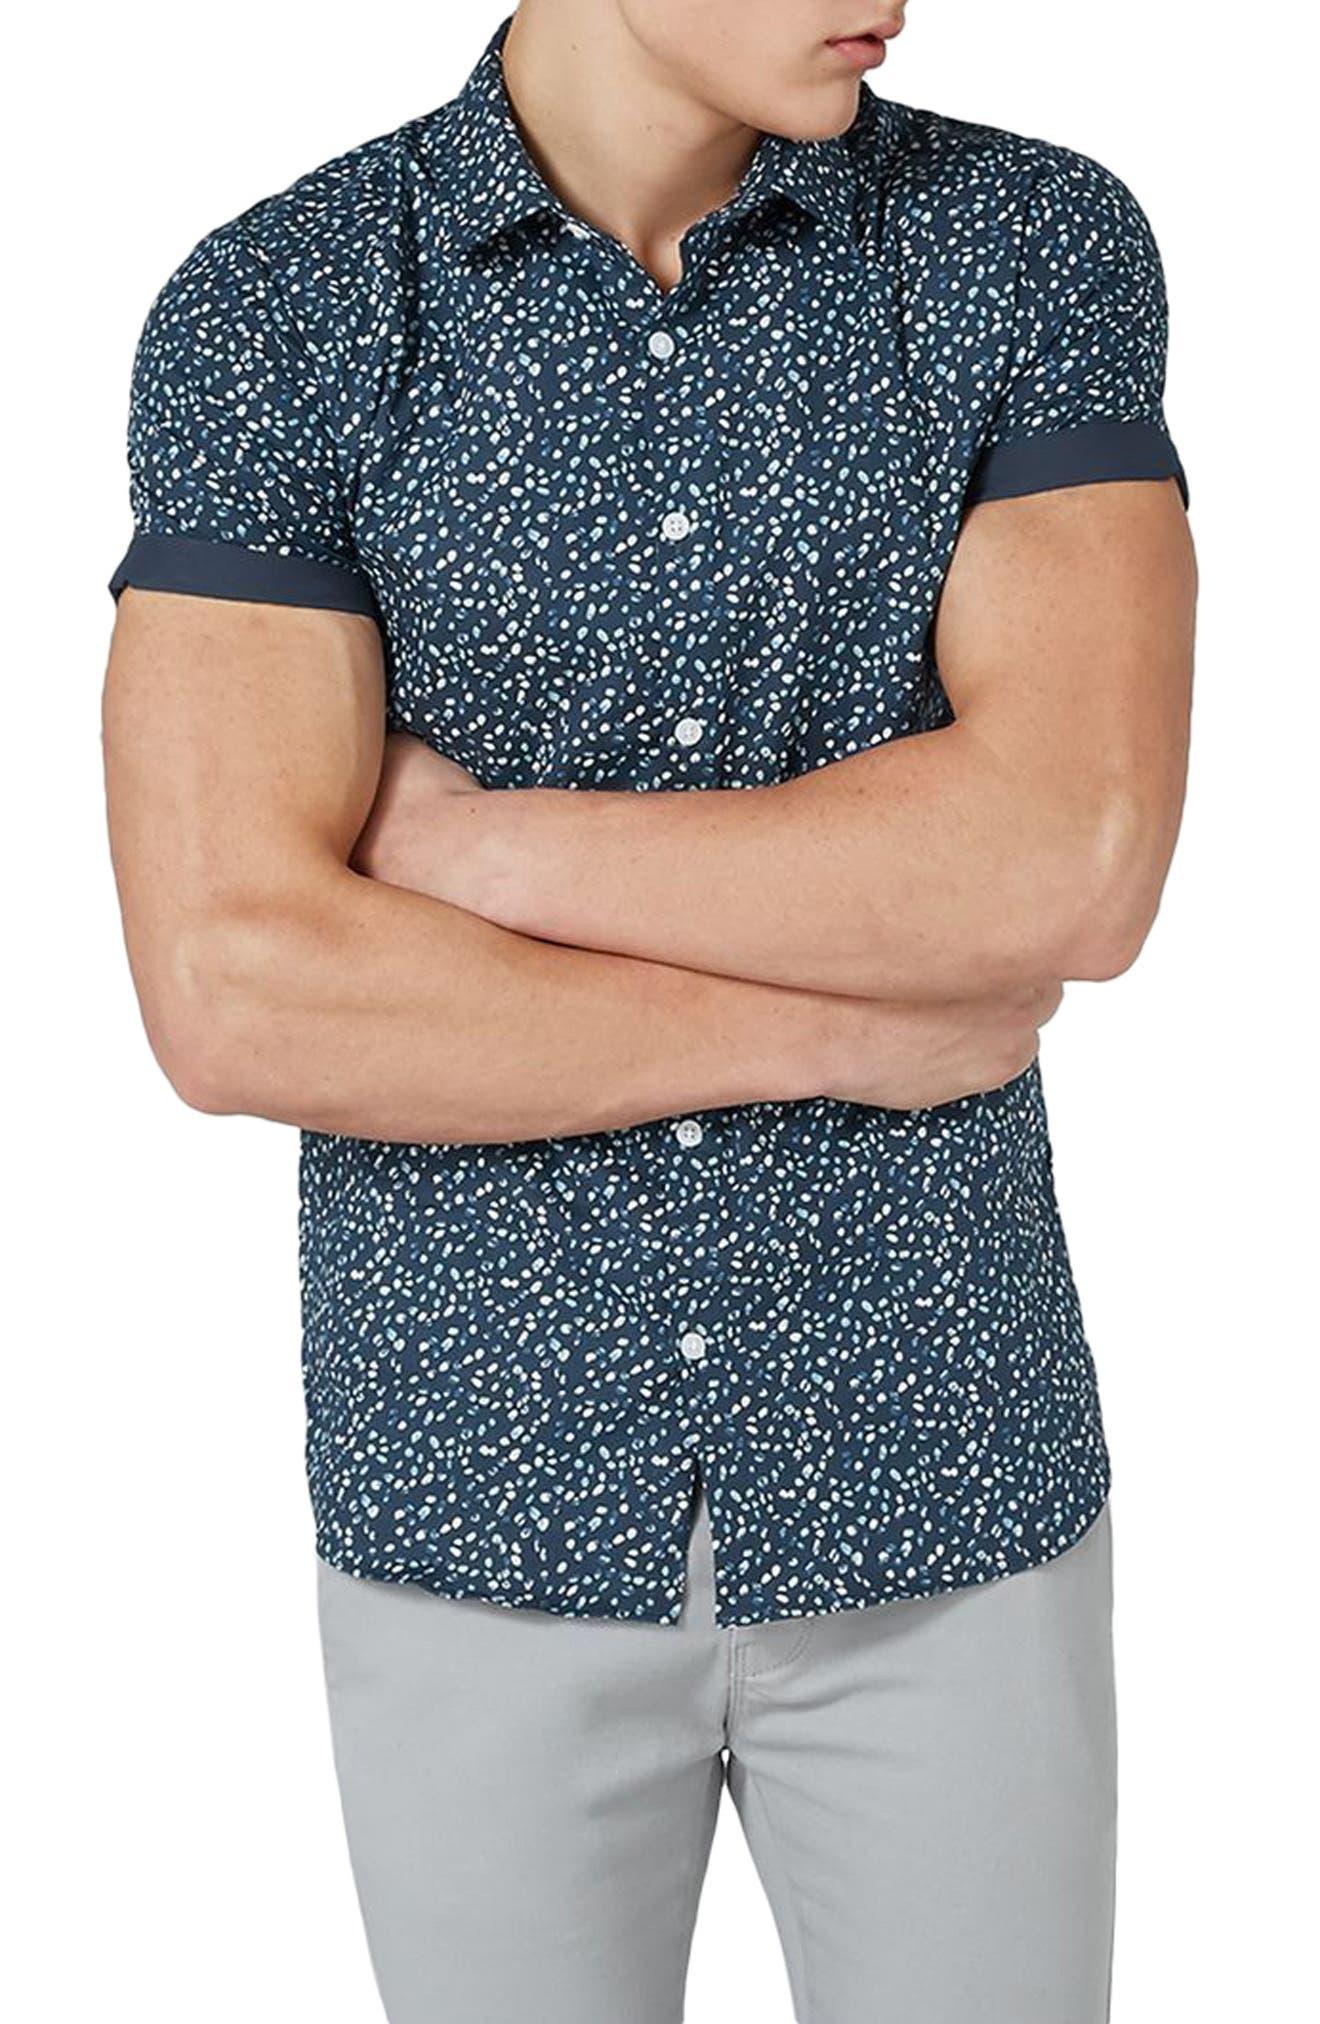 Muscle Fit Marble Print Shirt,                             Main thumbnail 1, color,                             401